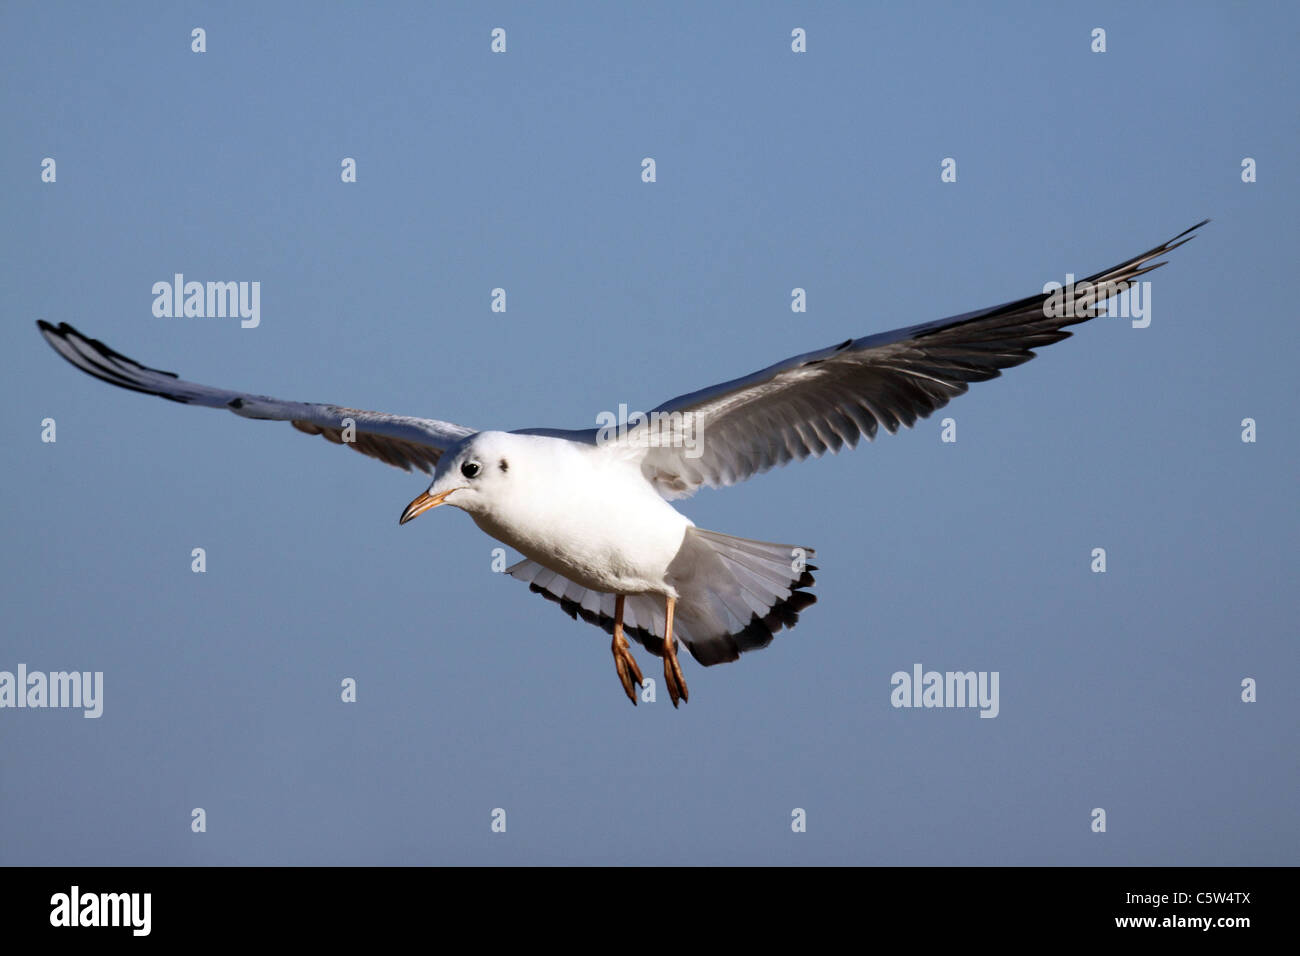 1st winter Black-headed Gull in flight - Stock Image